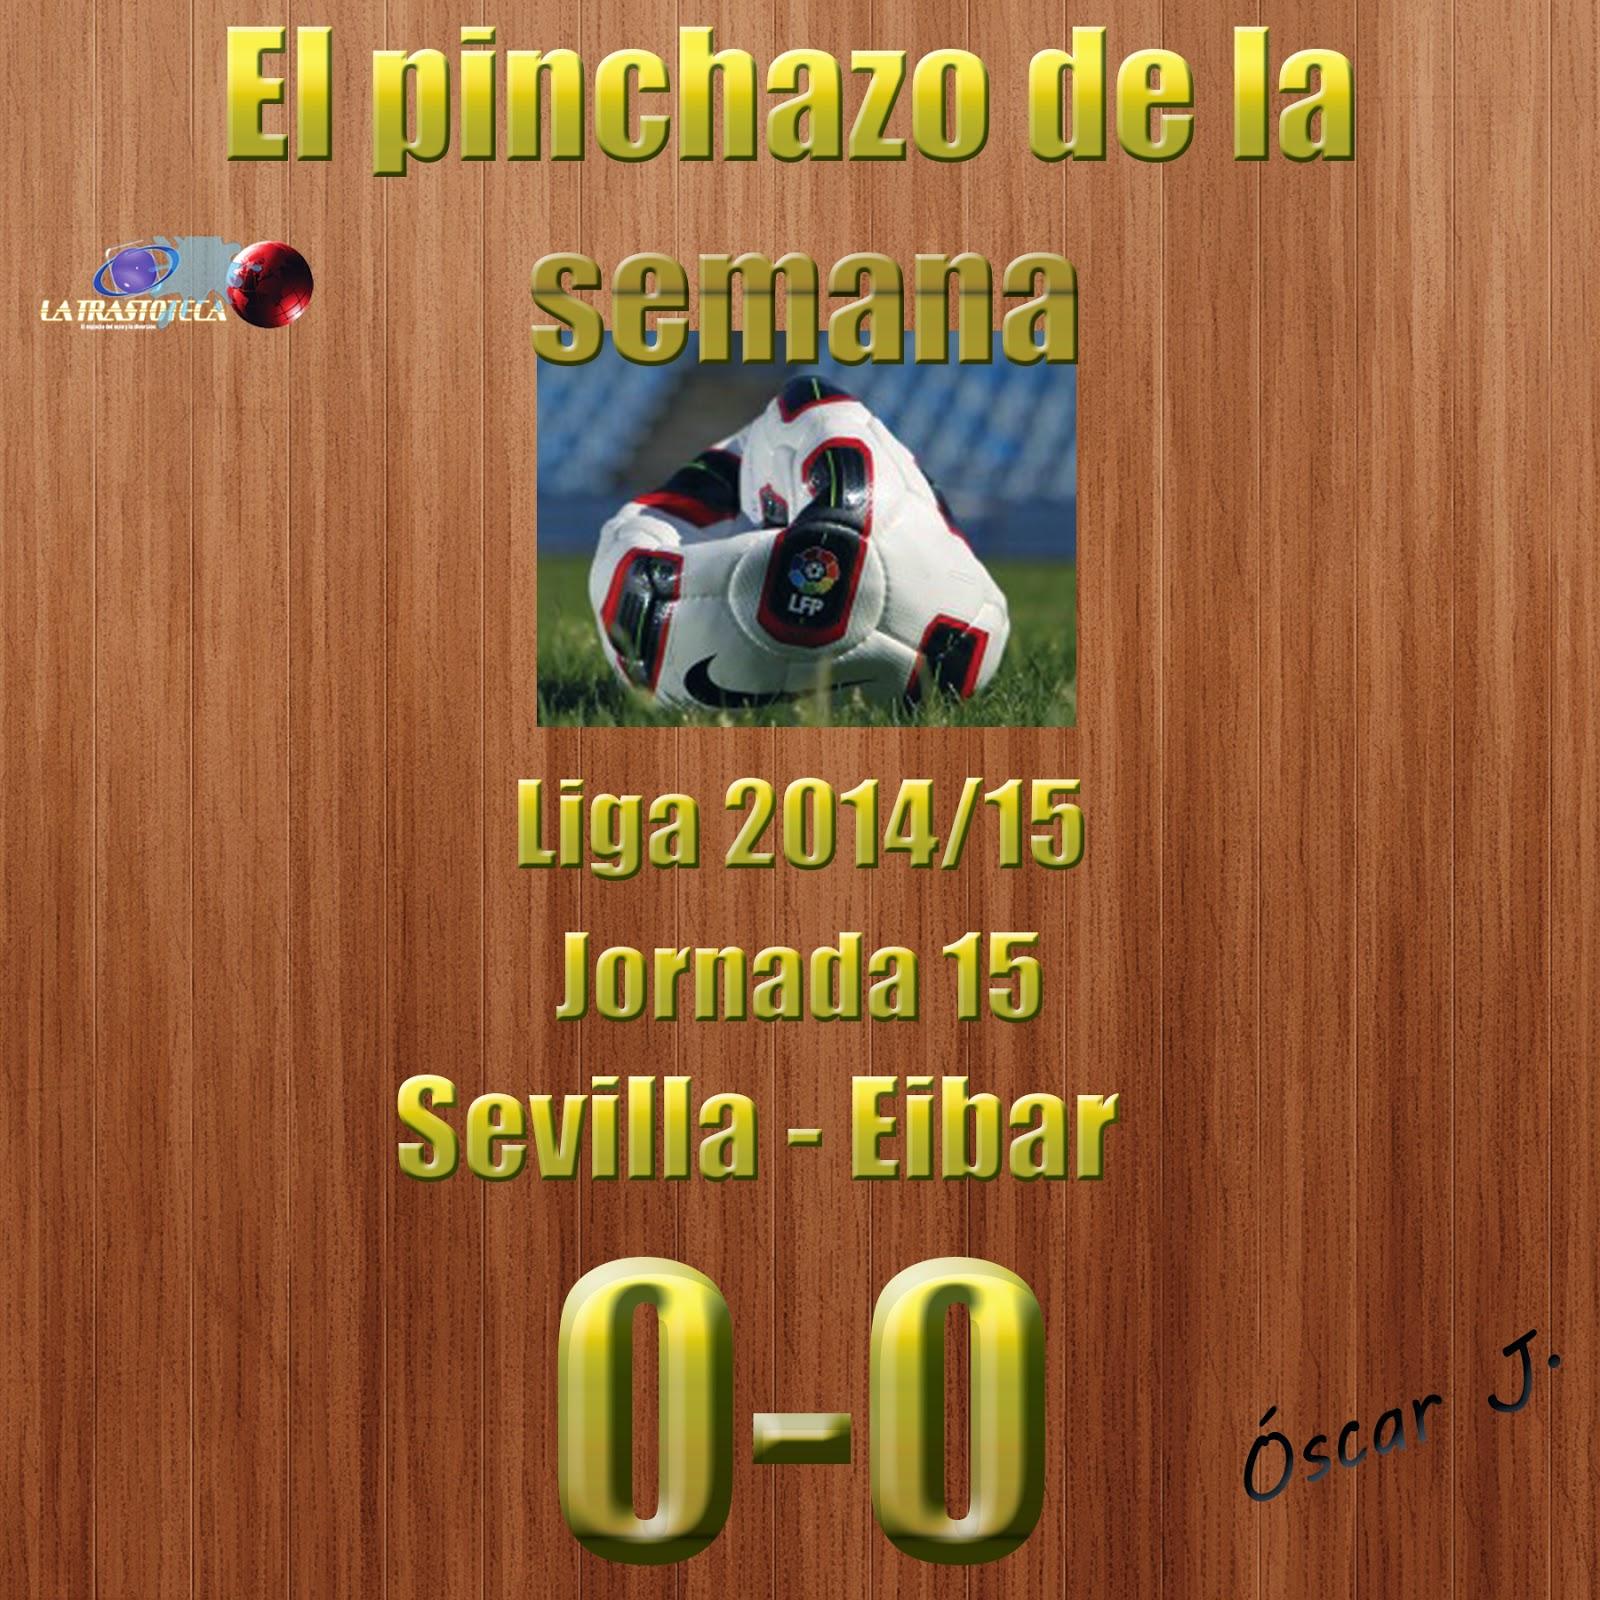 Sevilla 0-0 Eibar. Liga 2014/15 - Jornada 15. El pinchazo de la semana.